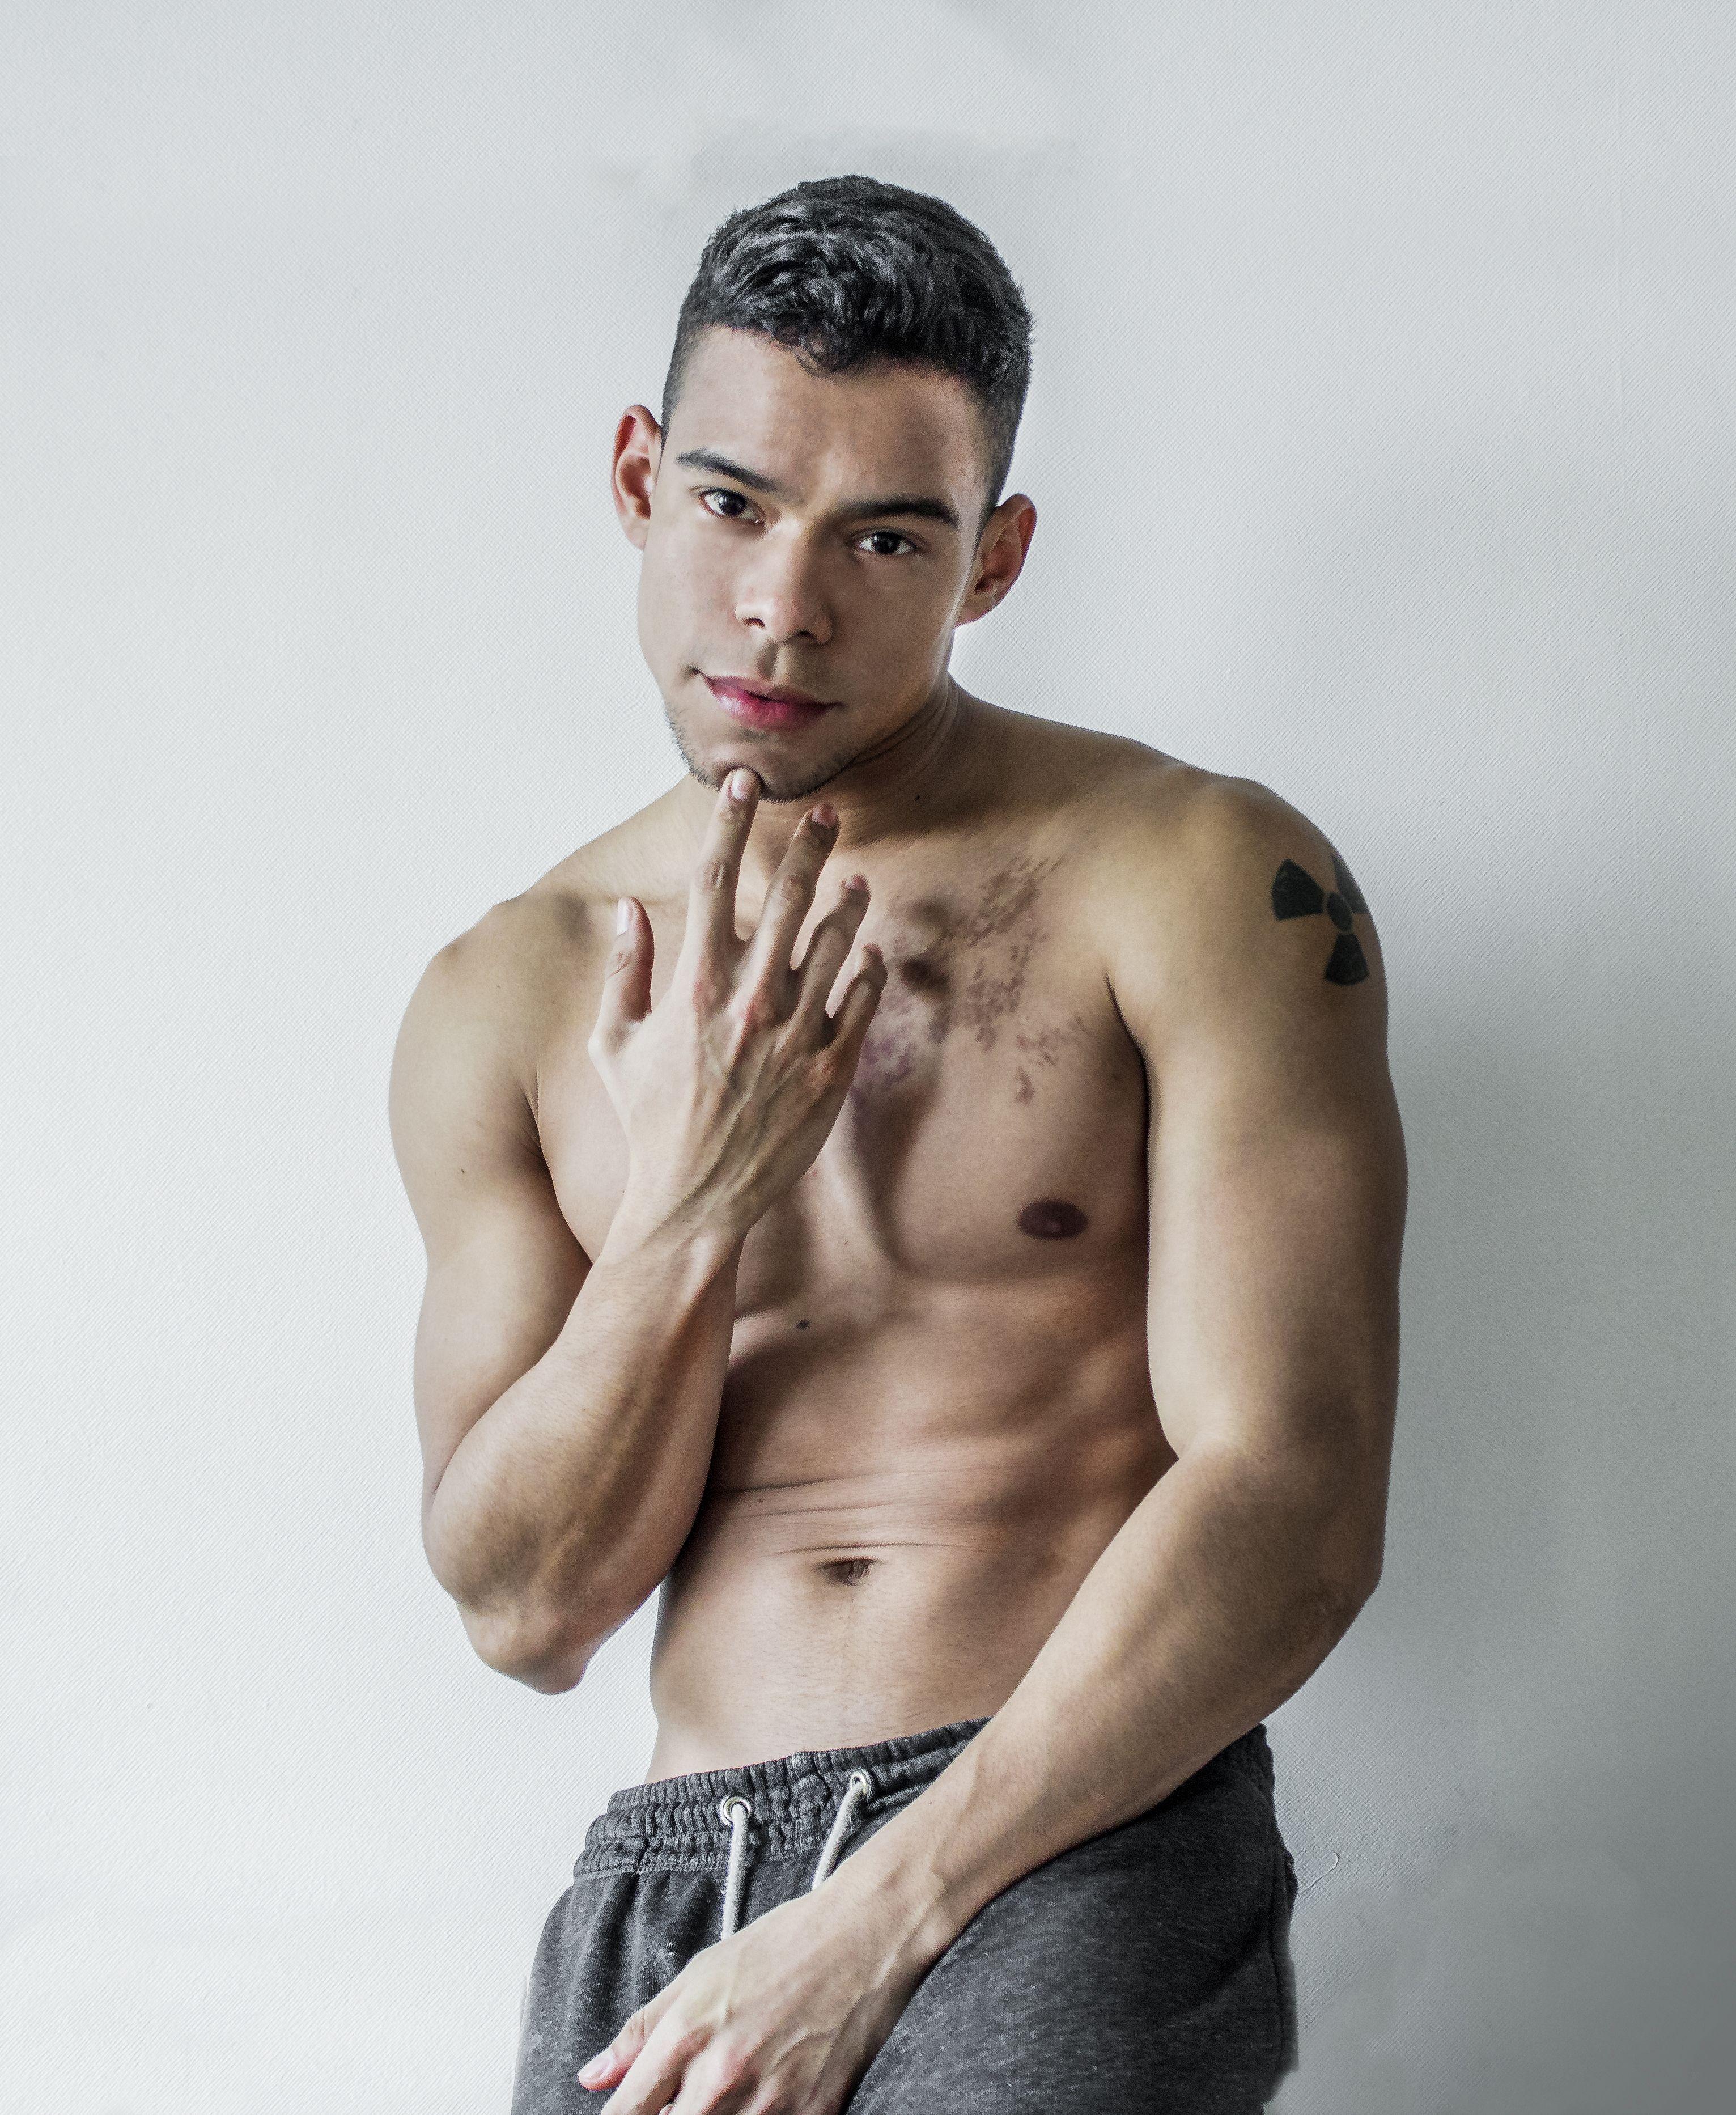 #Body #gym #fitness #fit #Latin #boy #model #TAttoo